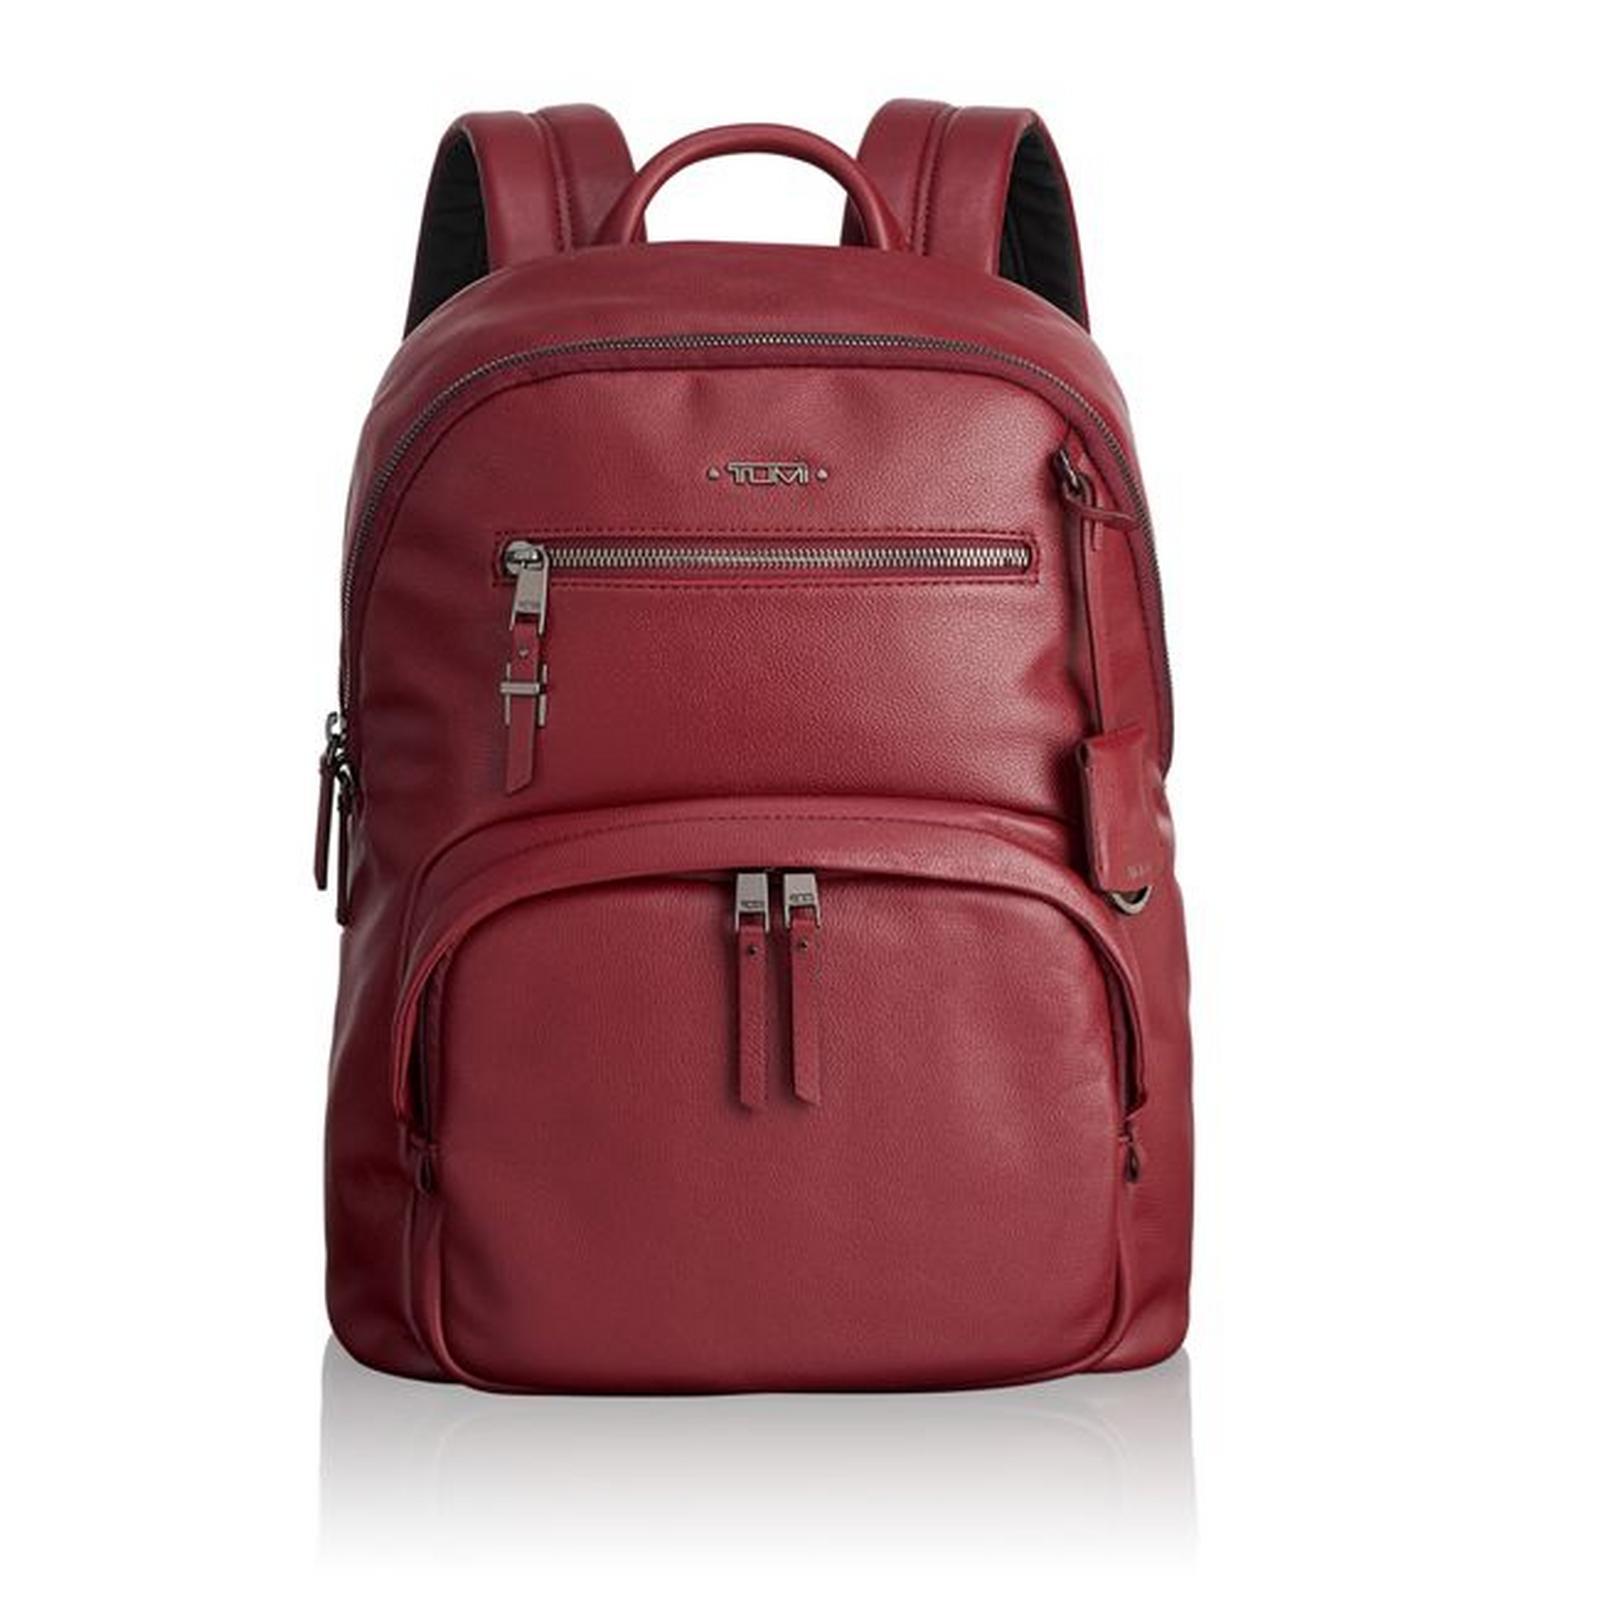 Hagen Backpack Leather